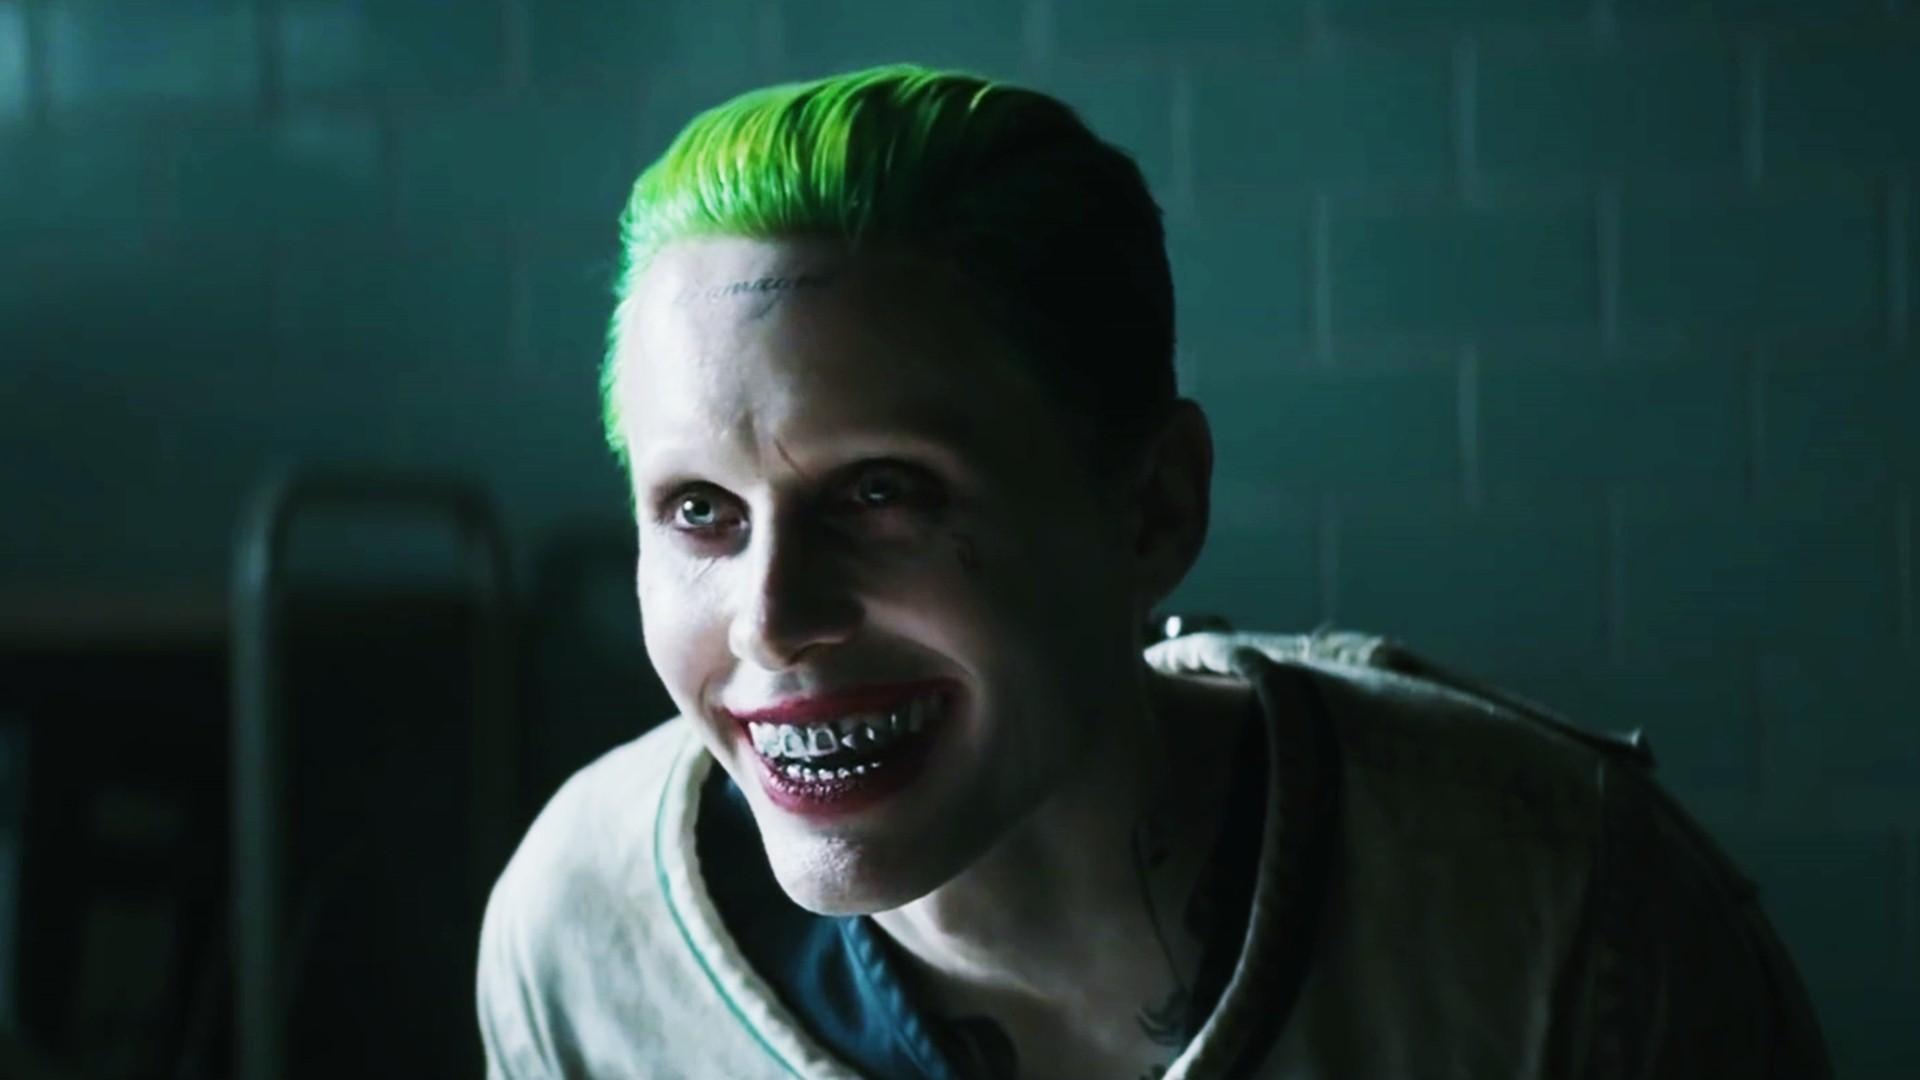 Joker Suicide Squad Wallpapers Wallpapertag